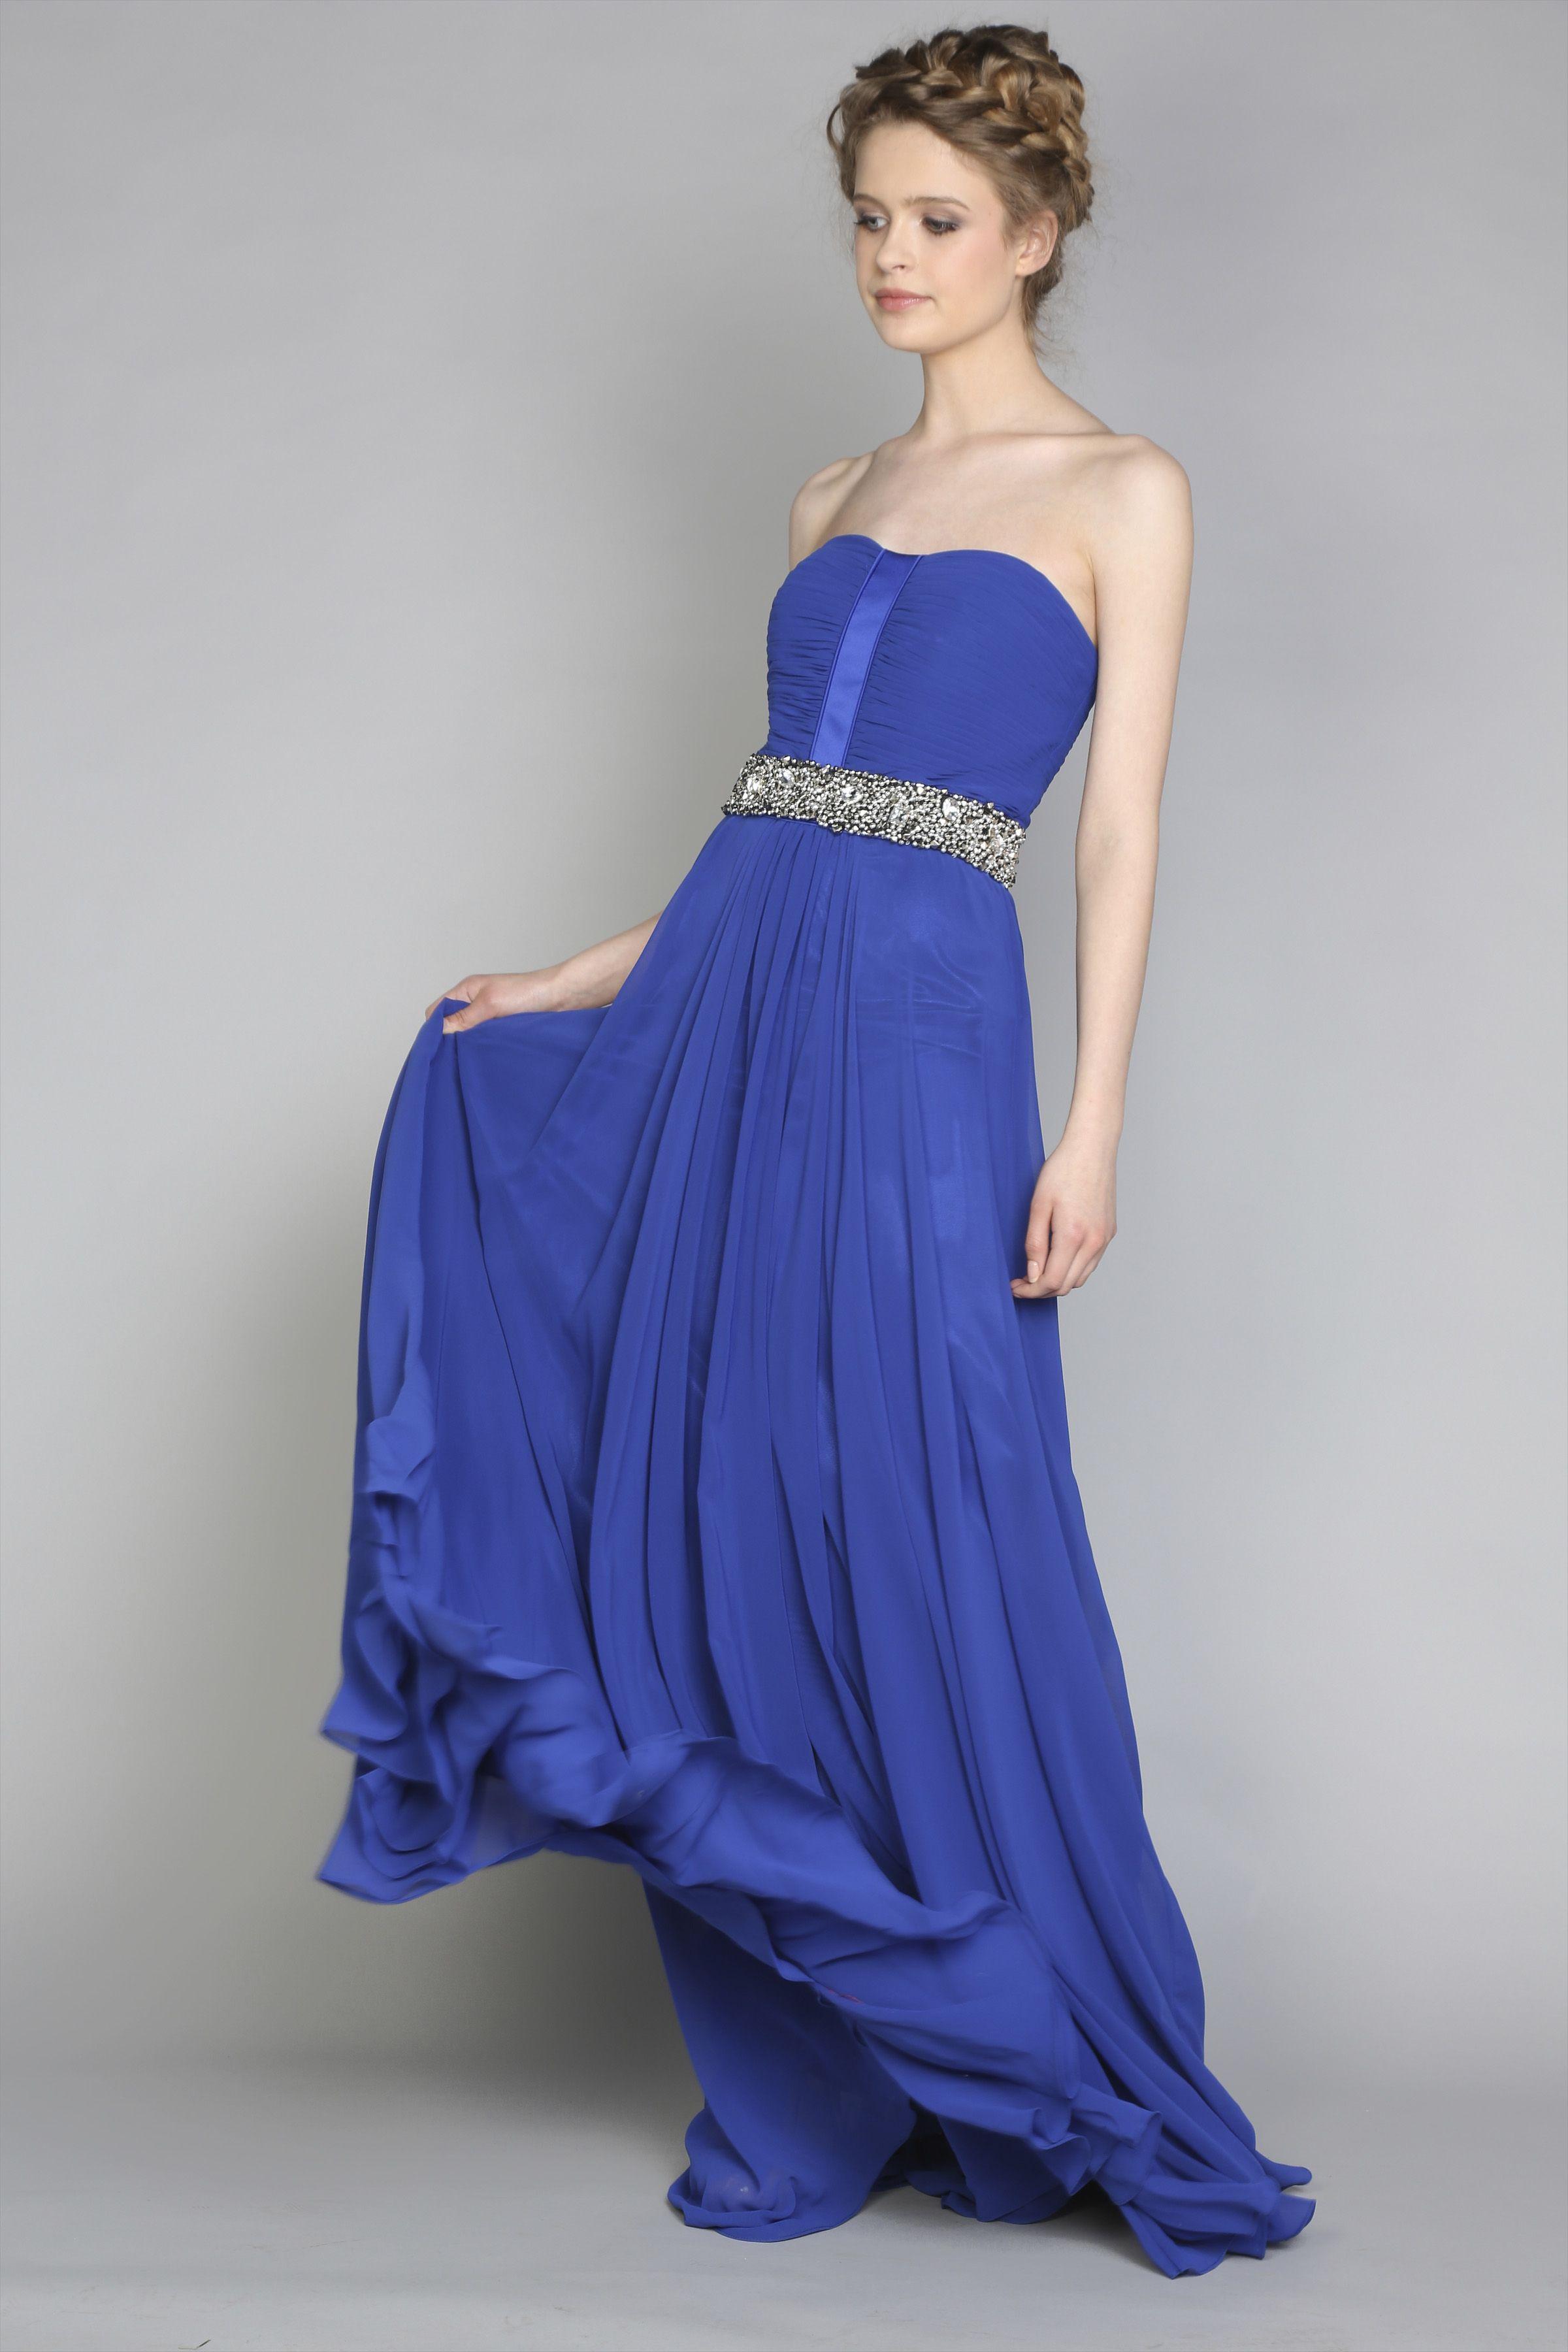 2c94ed7ae0 Royal blue debs dress